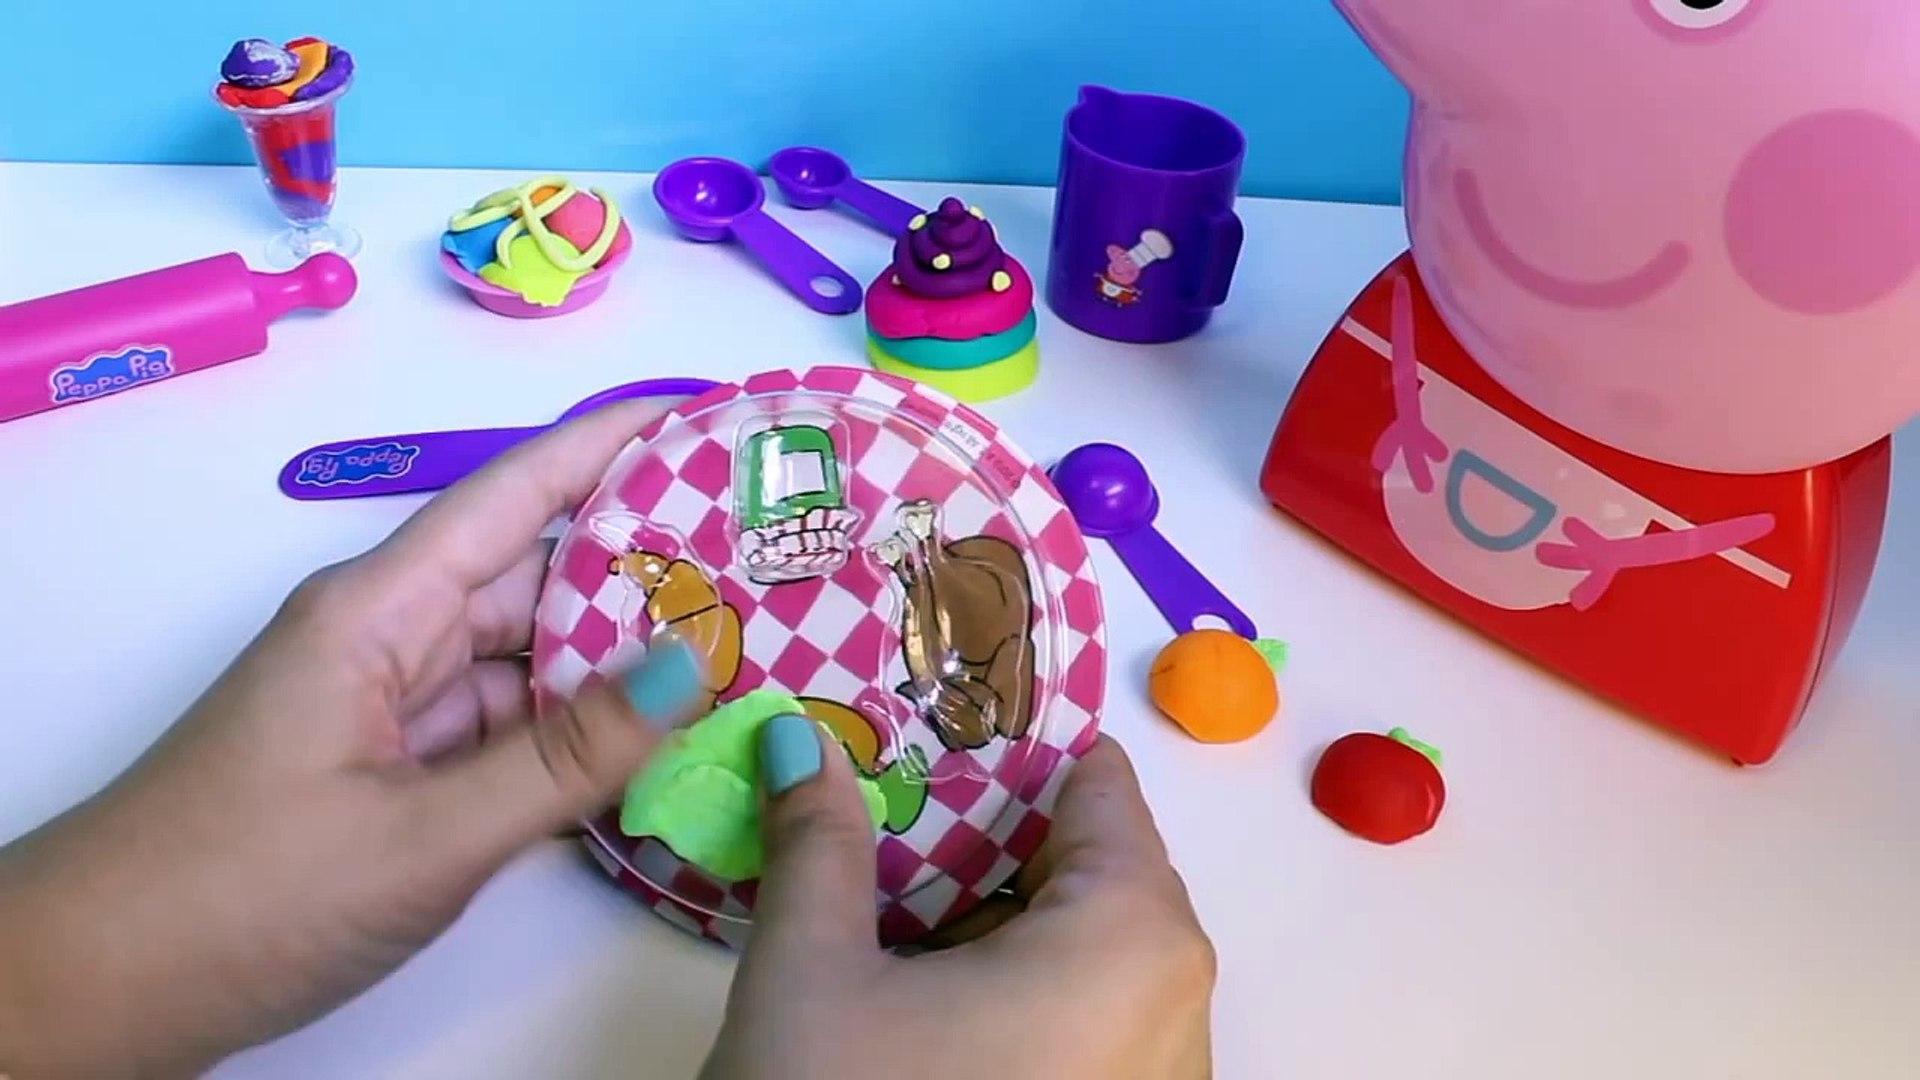 Peppa Pig Cooking Play Set Play Doh Food Ice Cream Playdough Chef Peppa Pig Cooking Set Carry Case